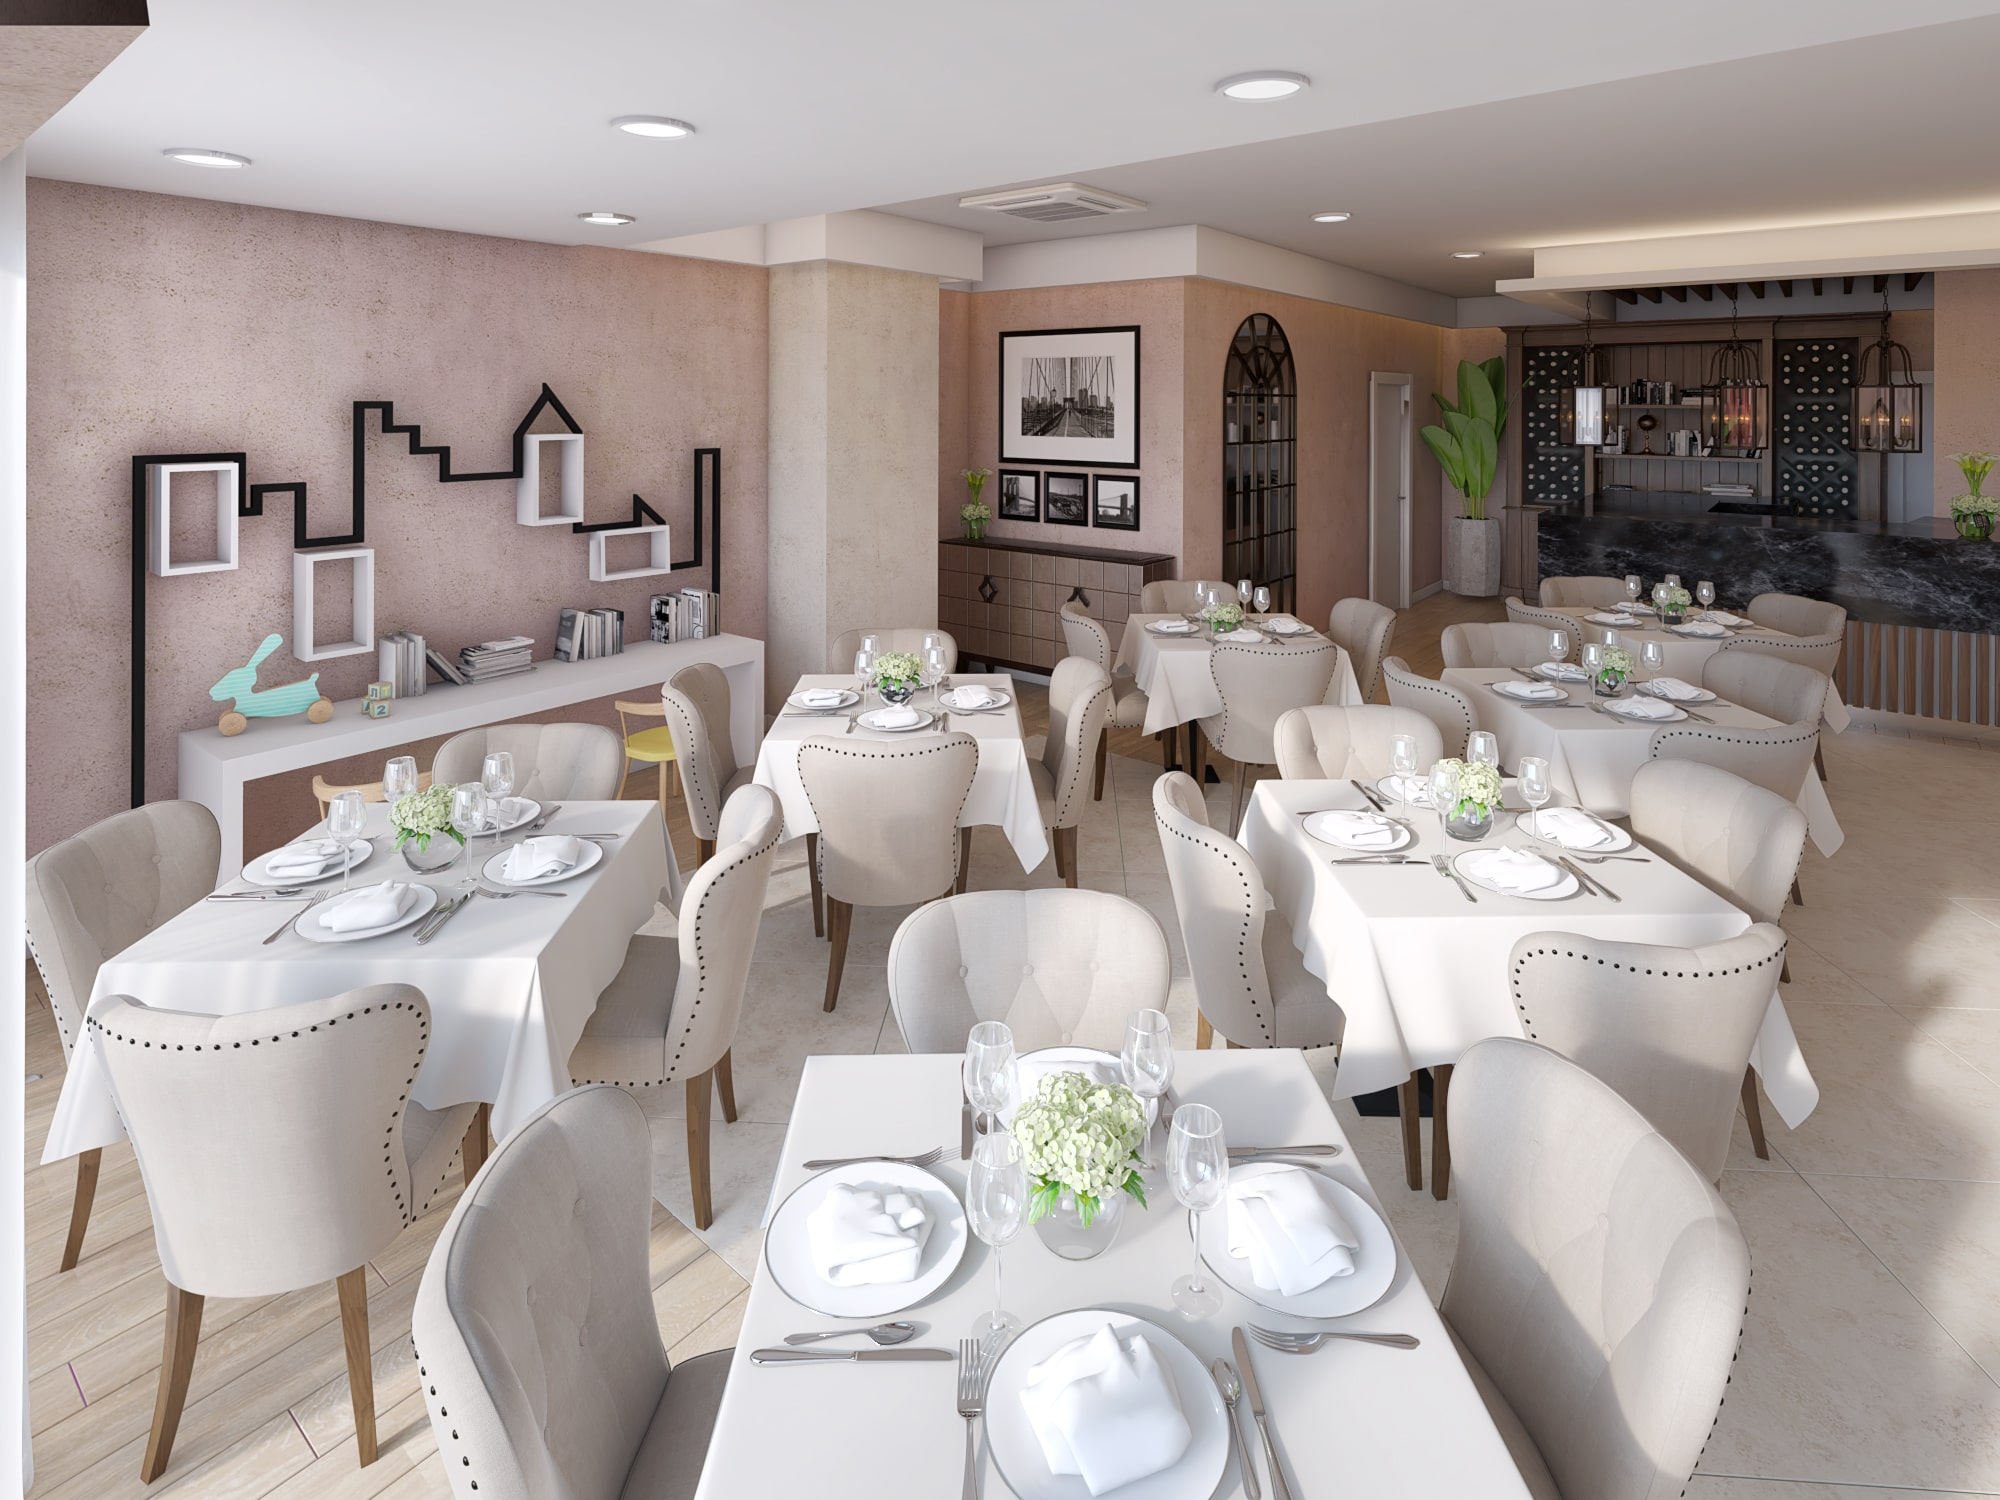 Restaurant in Montenegro ANATOLIA Lounge Cafe Becici - Budva 2.jpg